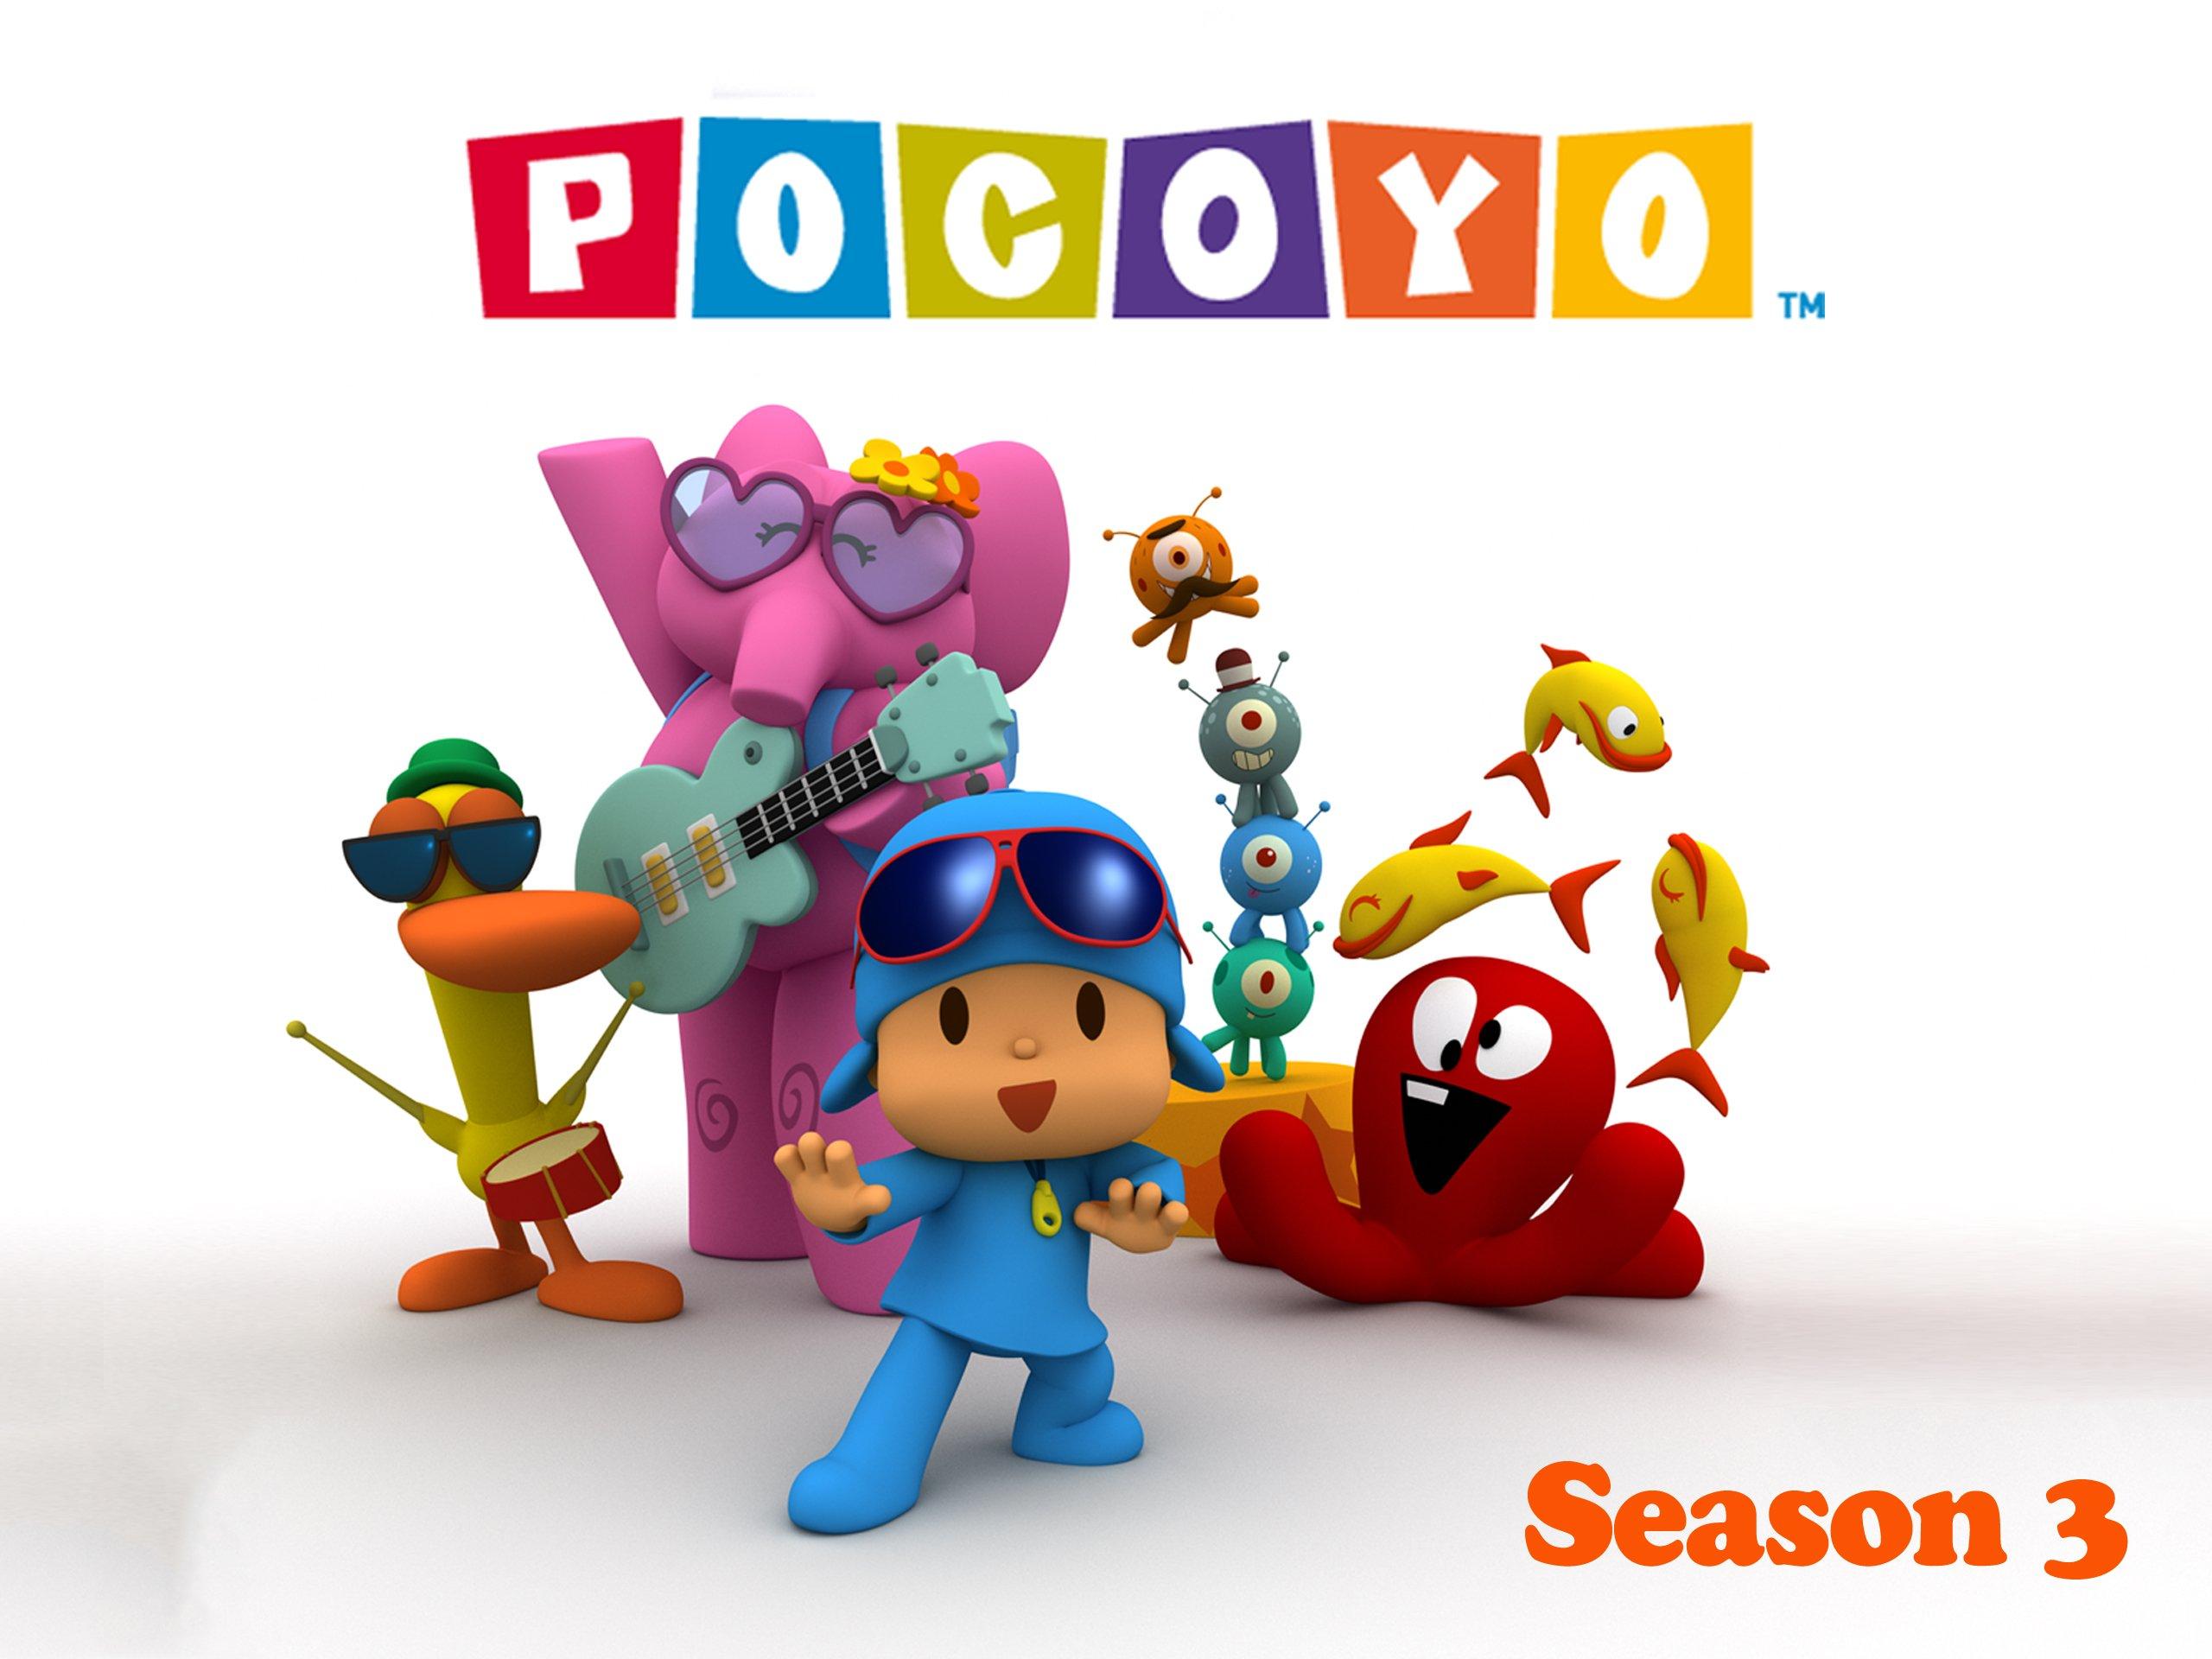 Amazon.com Pocoyo Season 3 Let\u0027s Go Pocoyo Amazon Digital Services LLC  sc 1 st  Amazon.com & Amazon.com: Pocoyo Season 3: Let\u0027s Go Pocoyo: Amazon Digital ...